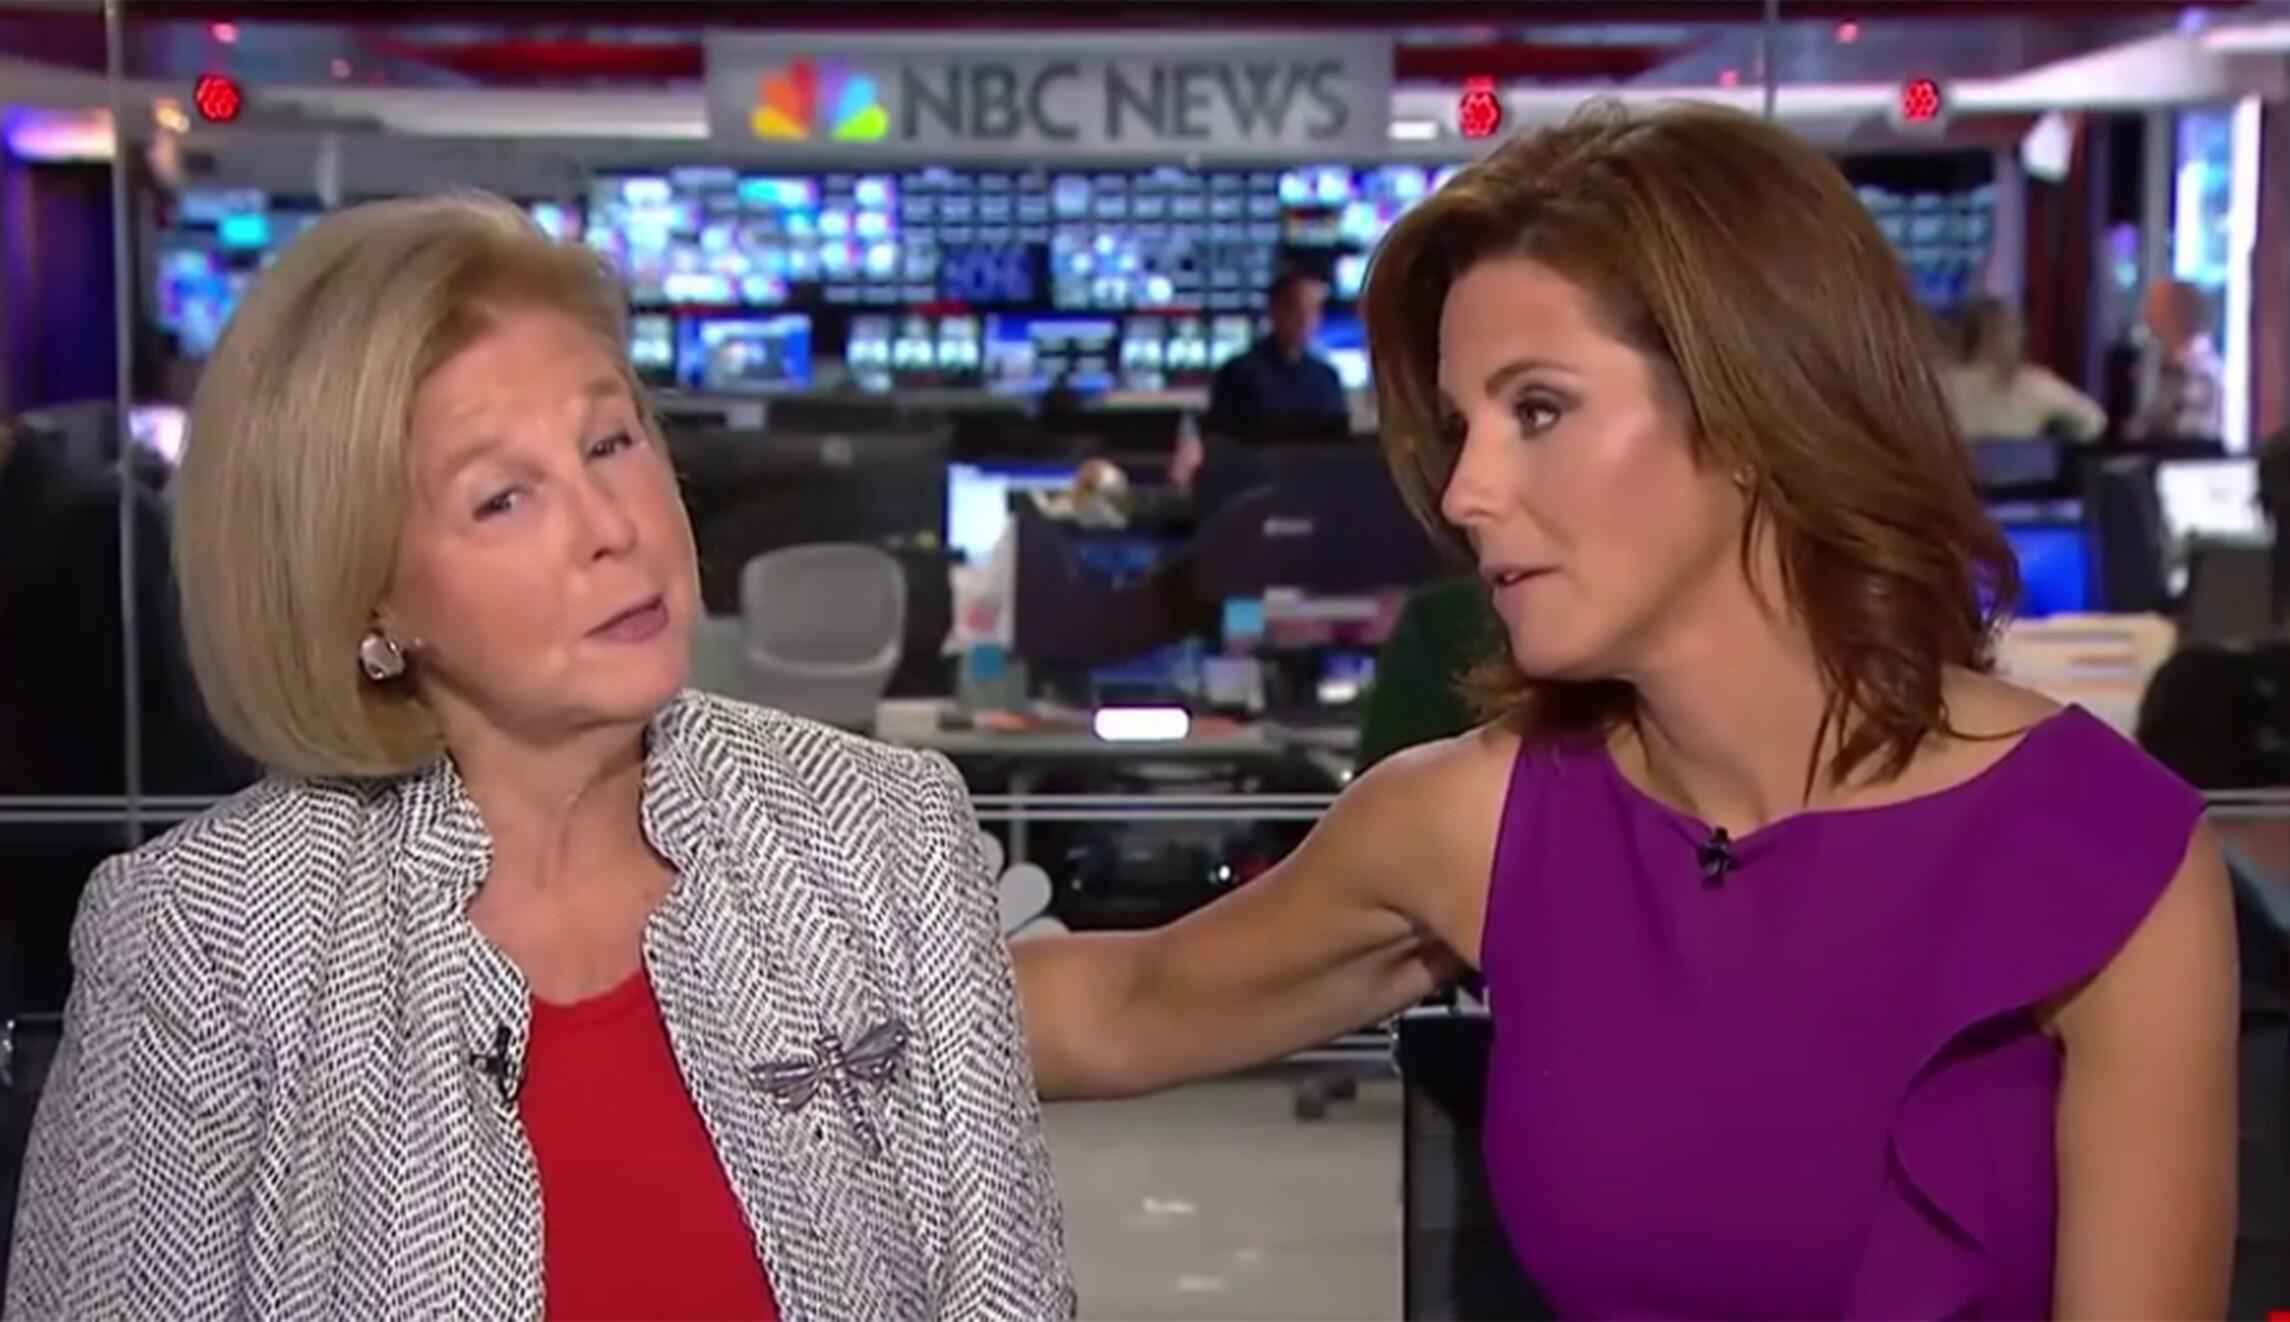 MSNBC anchor Stephanie Ruhle brings mom on air to lecture Trump